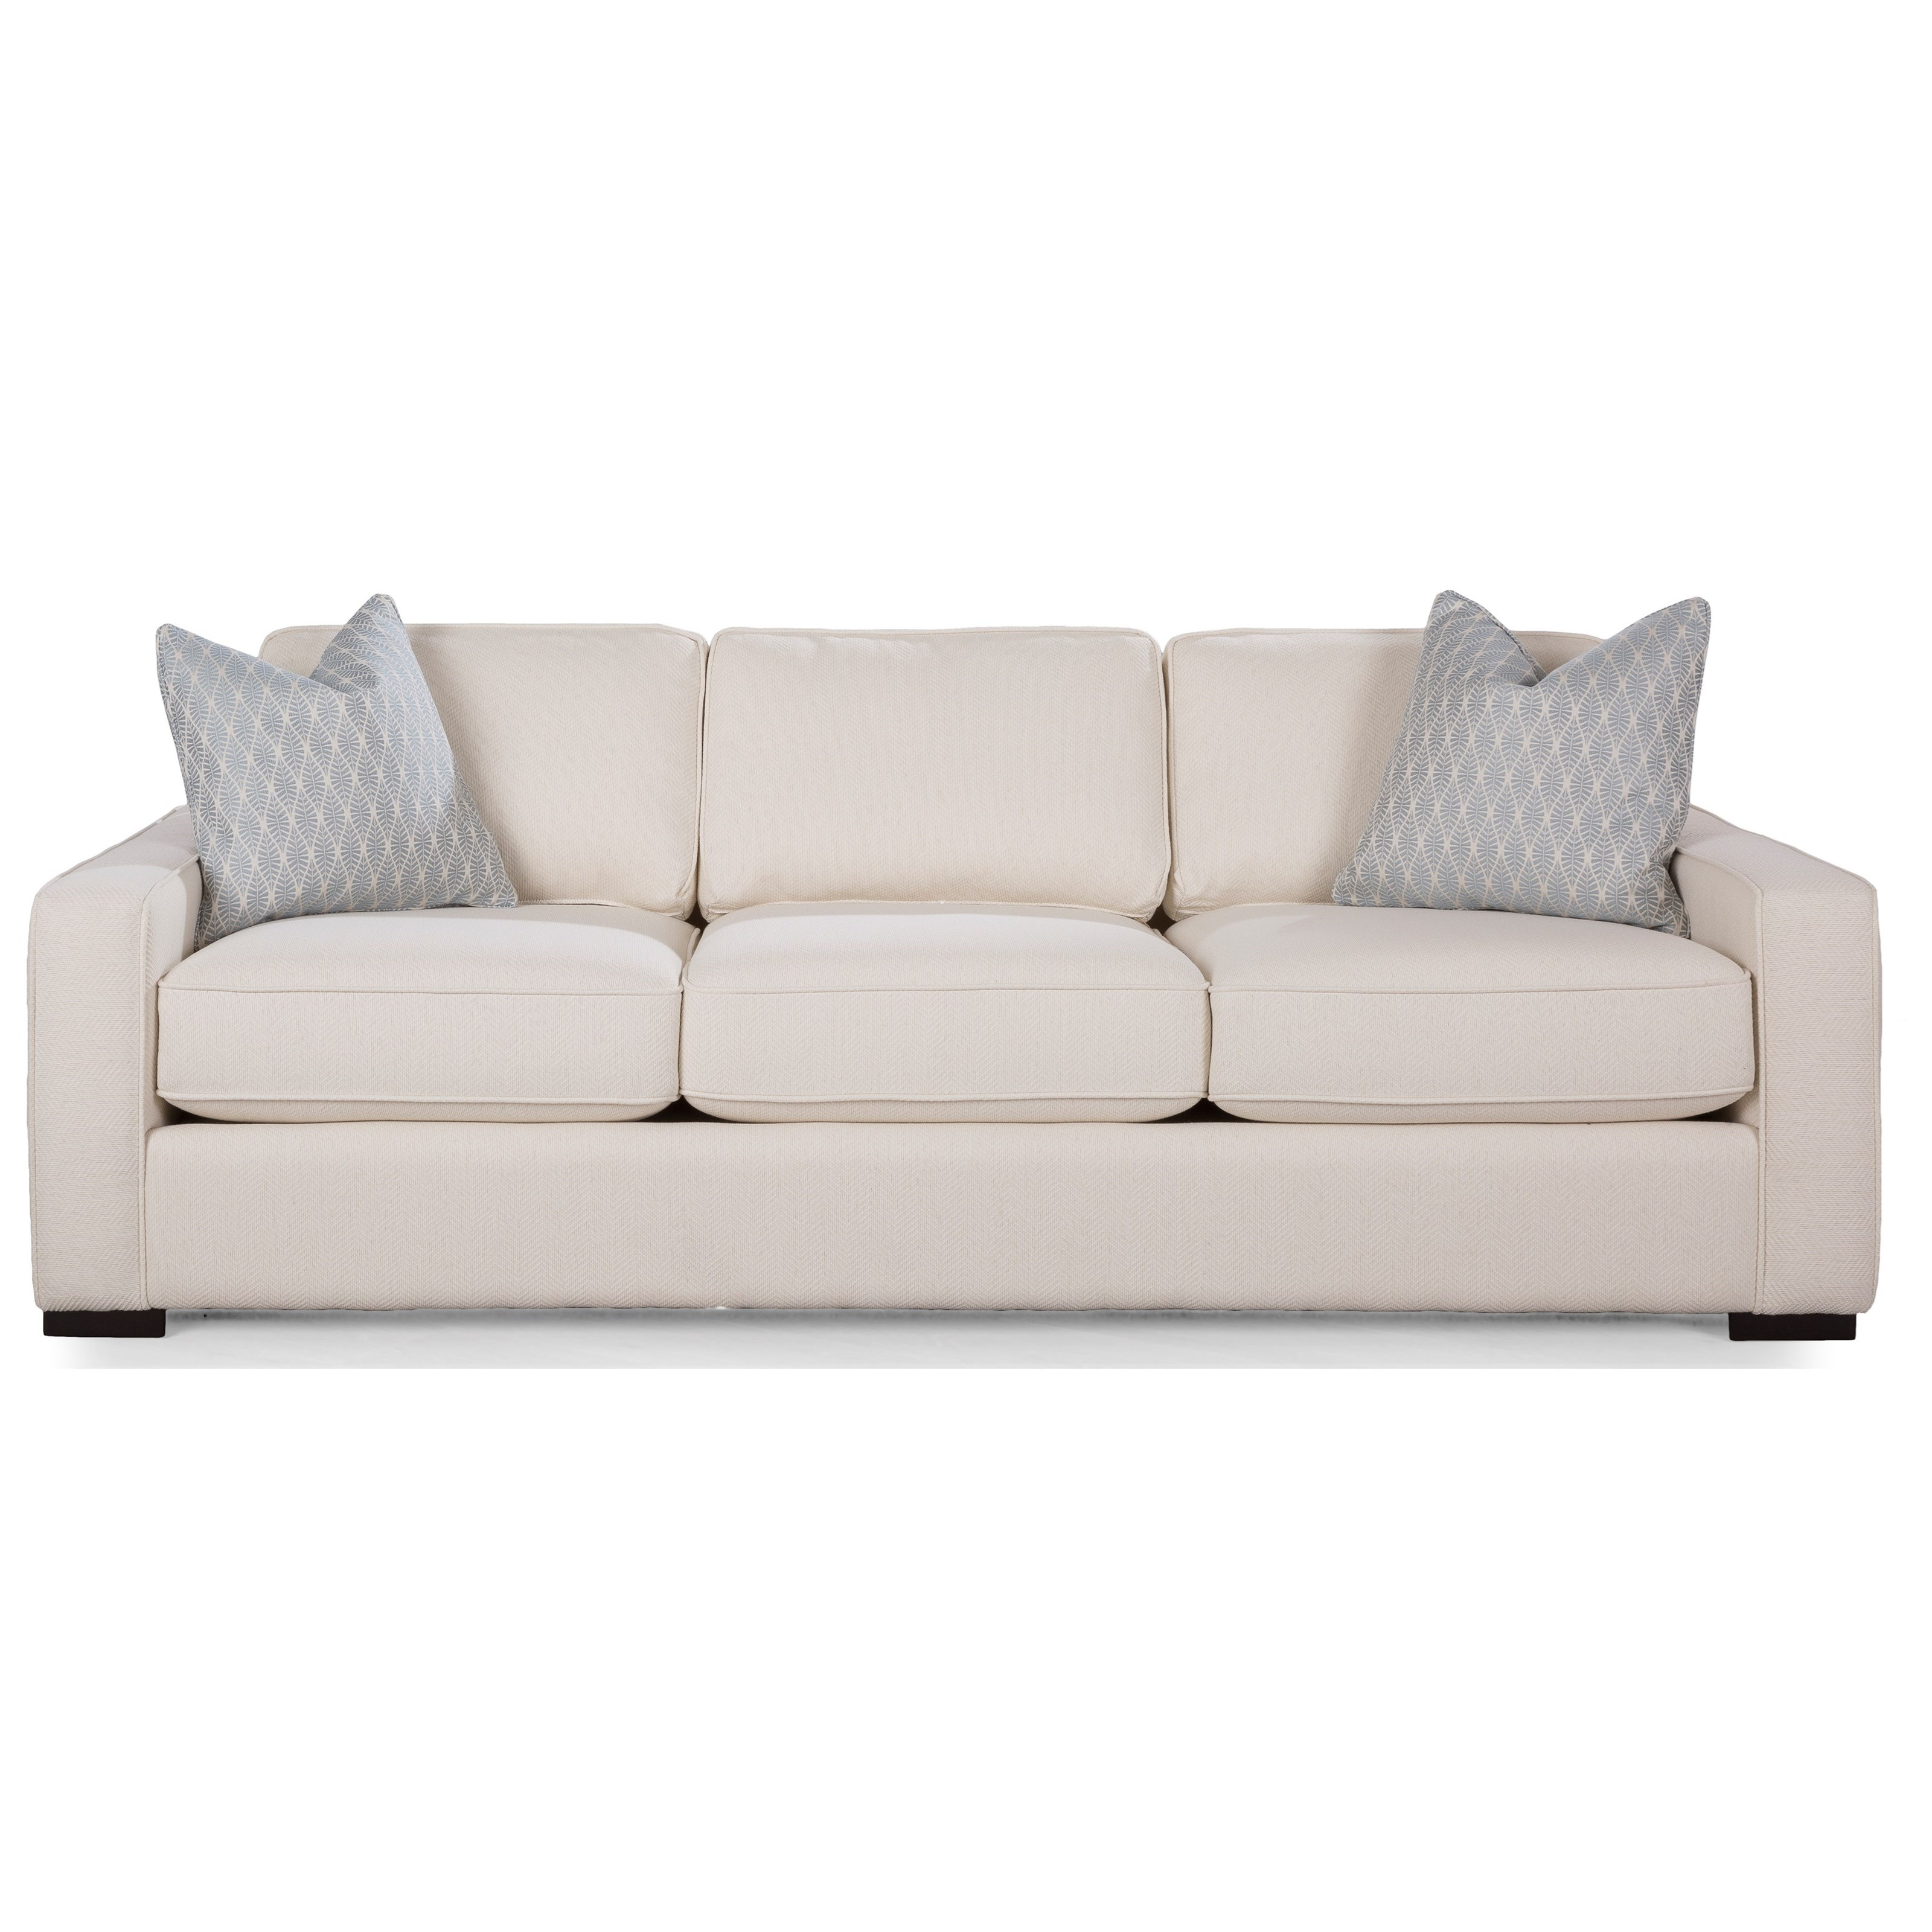 87 Inch Sofa